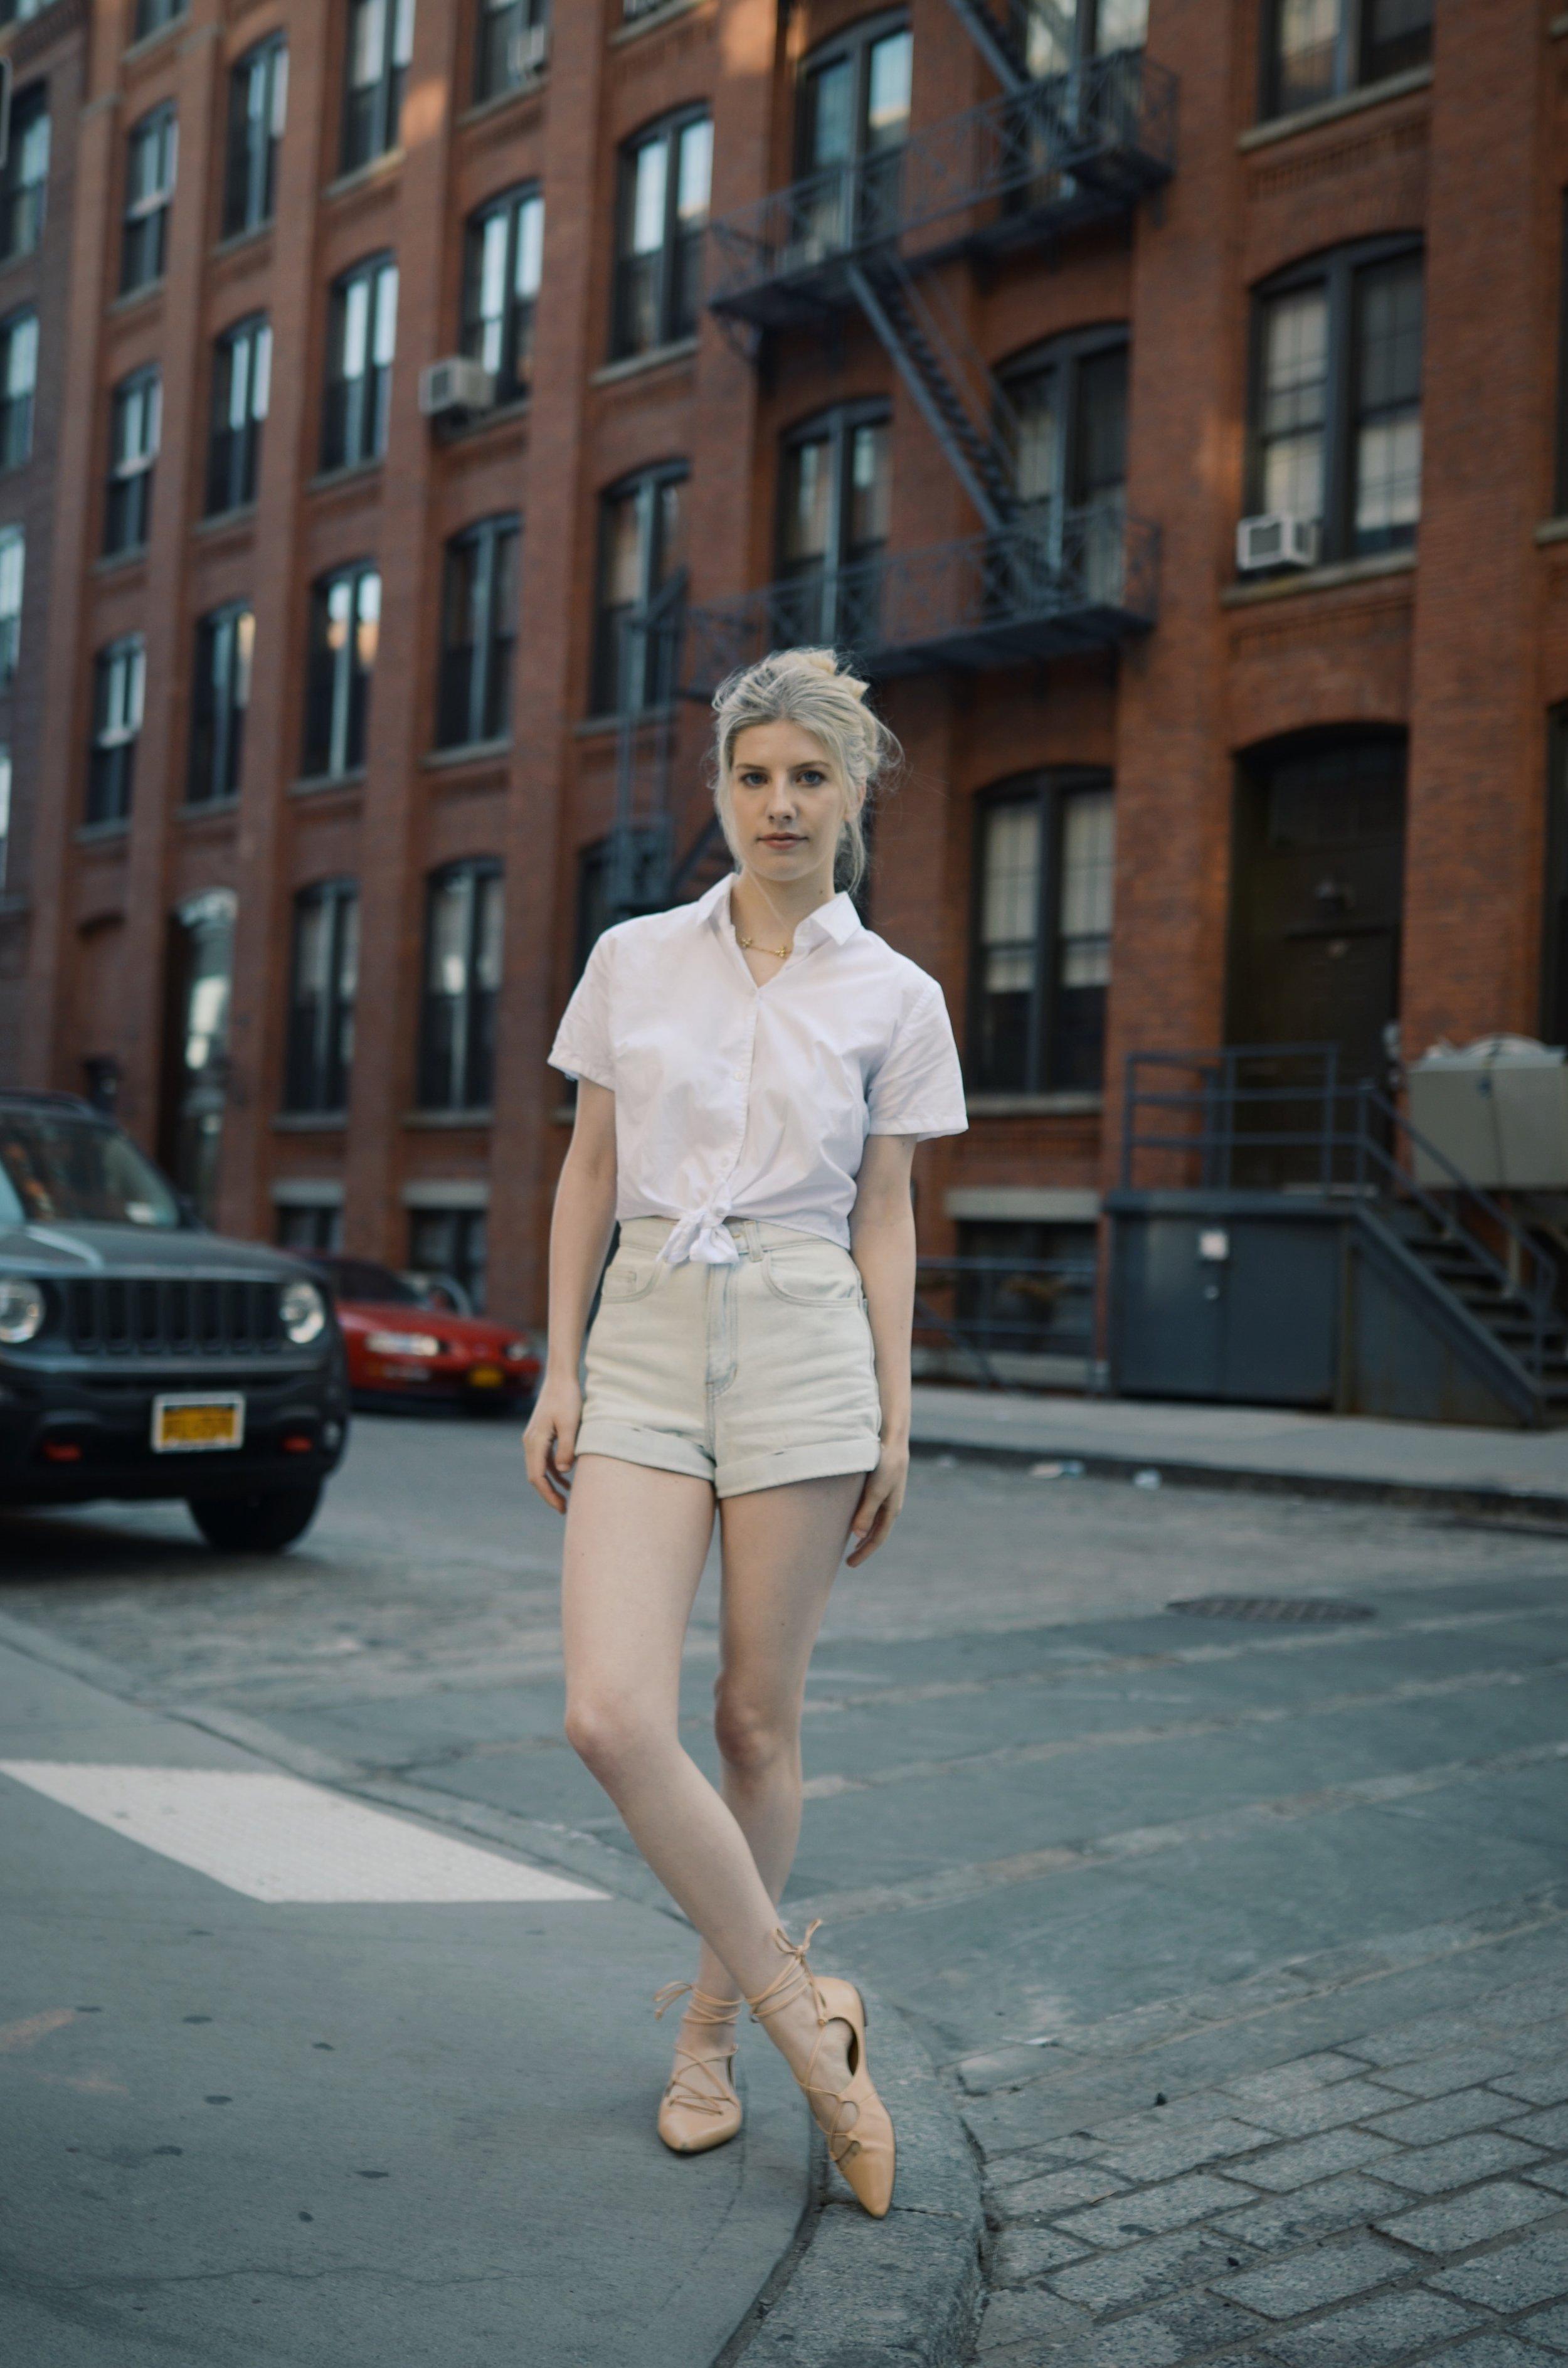 DUMBO, Brooklyn  June 2016